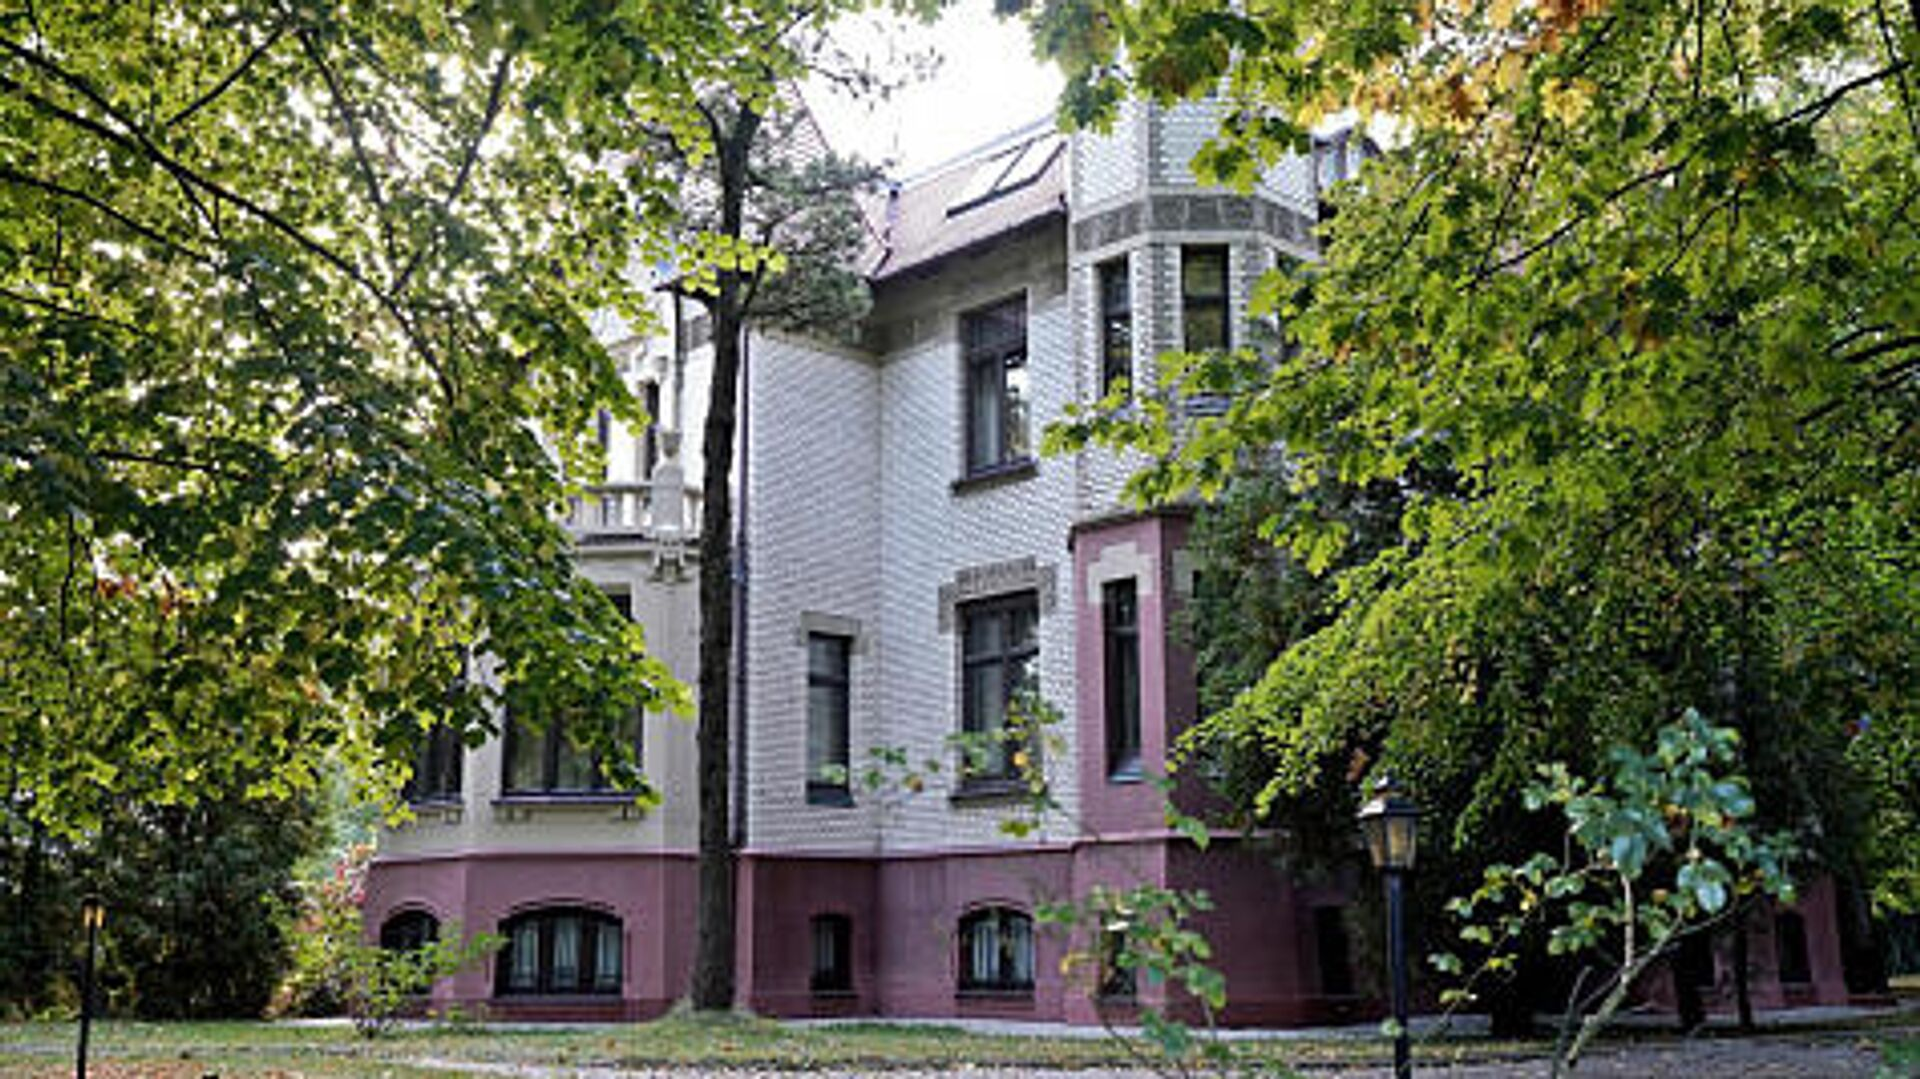 Резиденция почетного консула Греции в Калининграде - РИА Новости, 1920, 18.01.2021